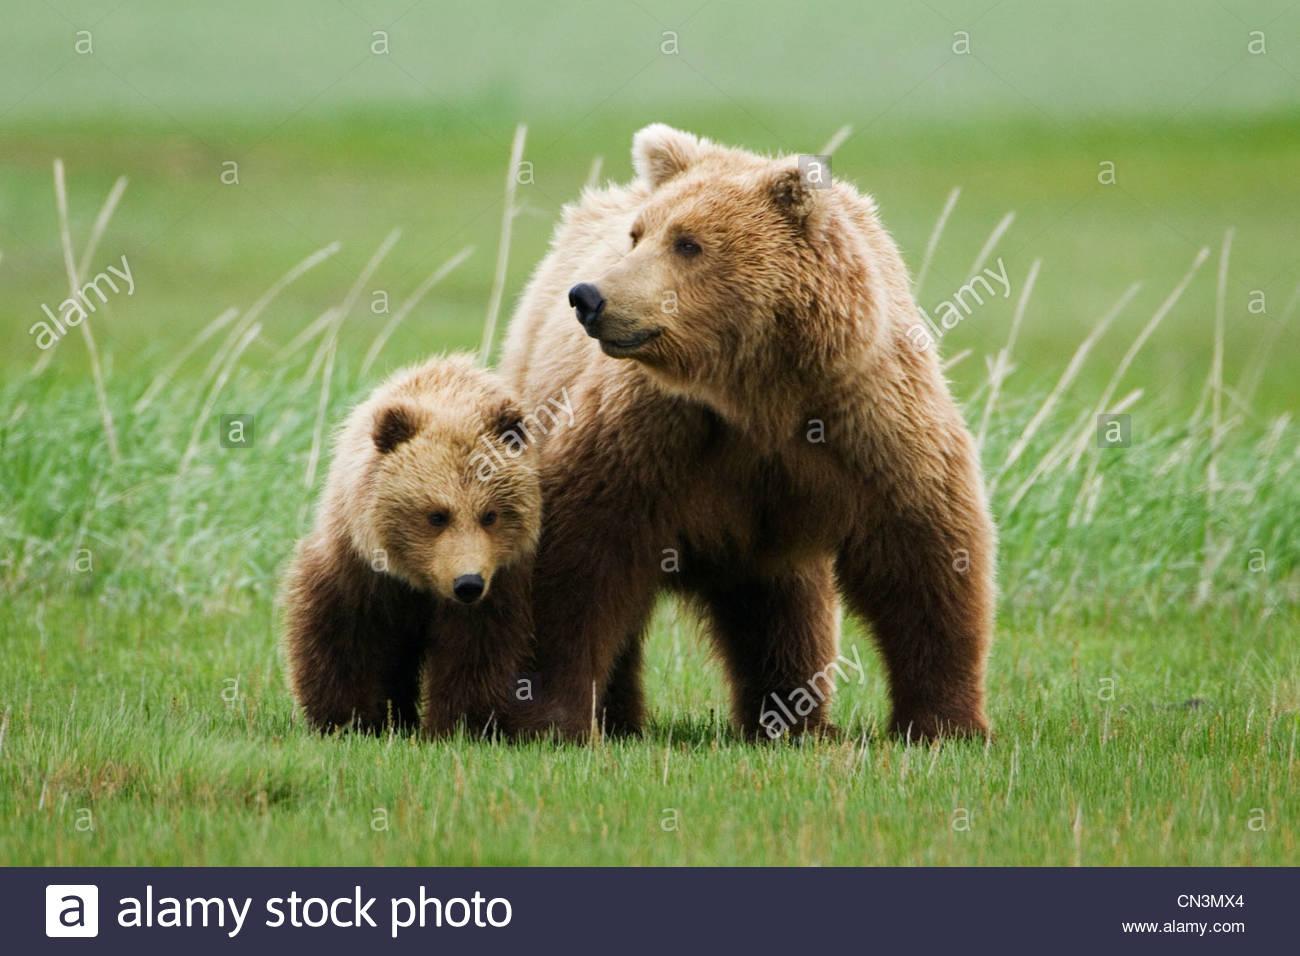 Oso Pardo madre y cub, Parque Nacional Katmai, Alaska Imagen De Stock